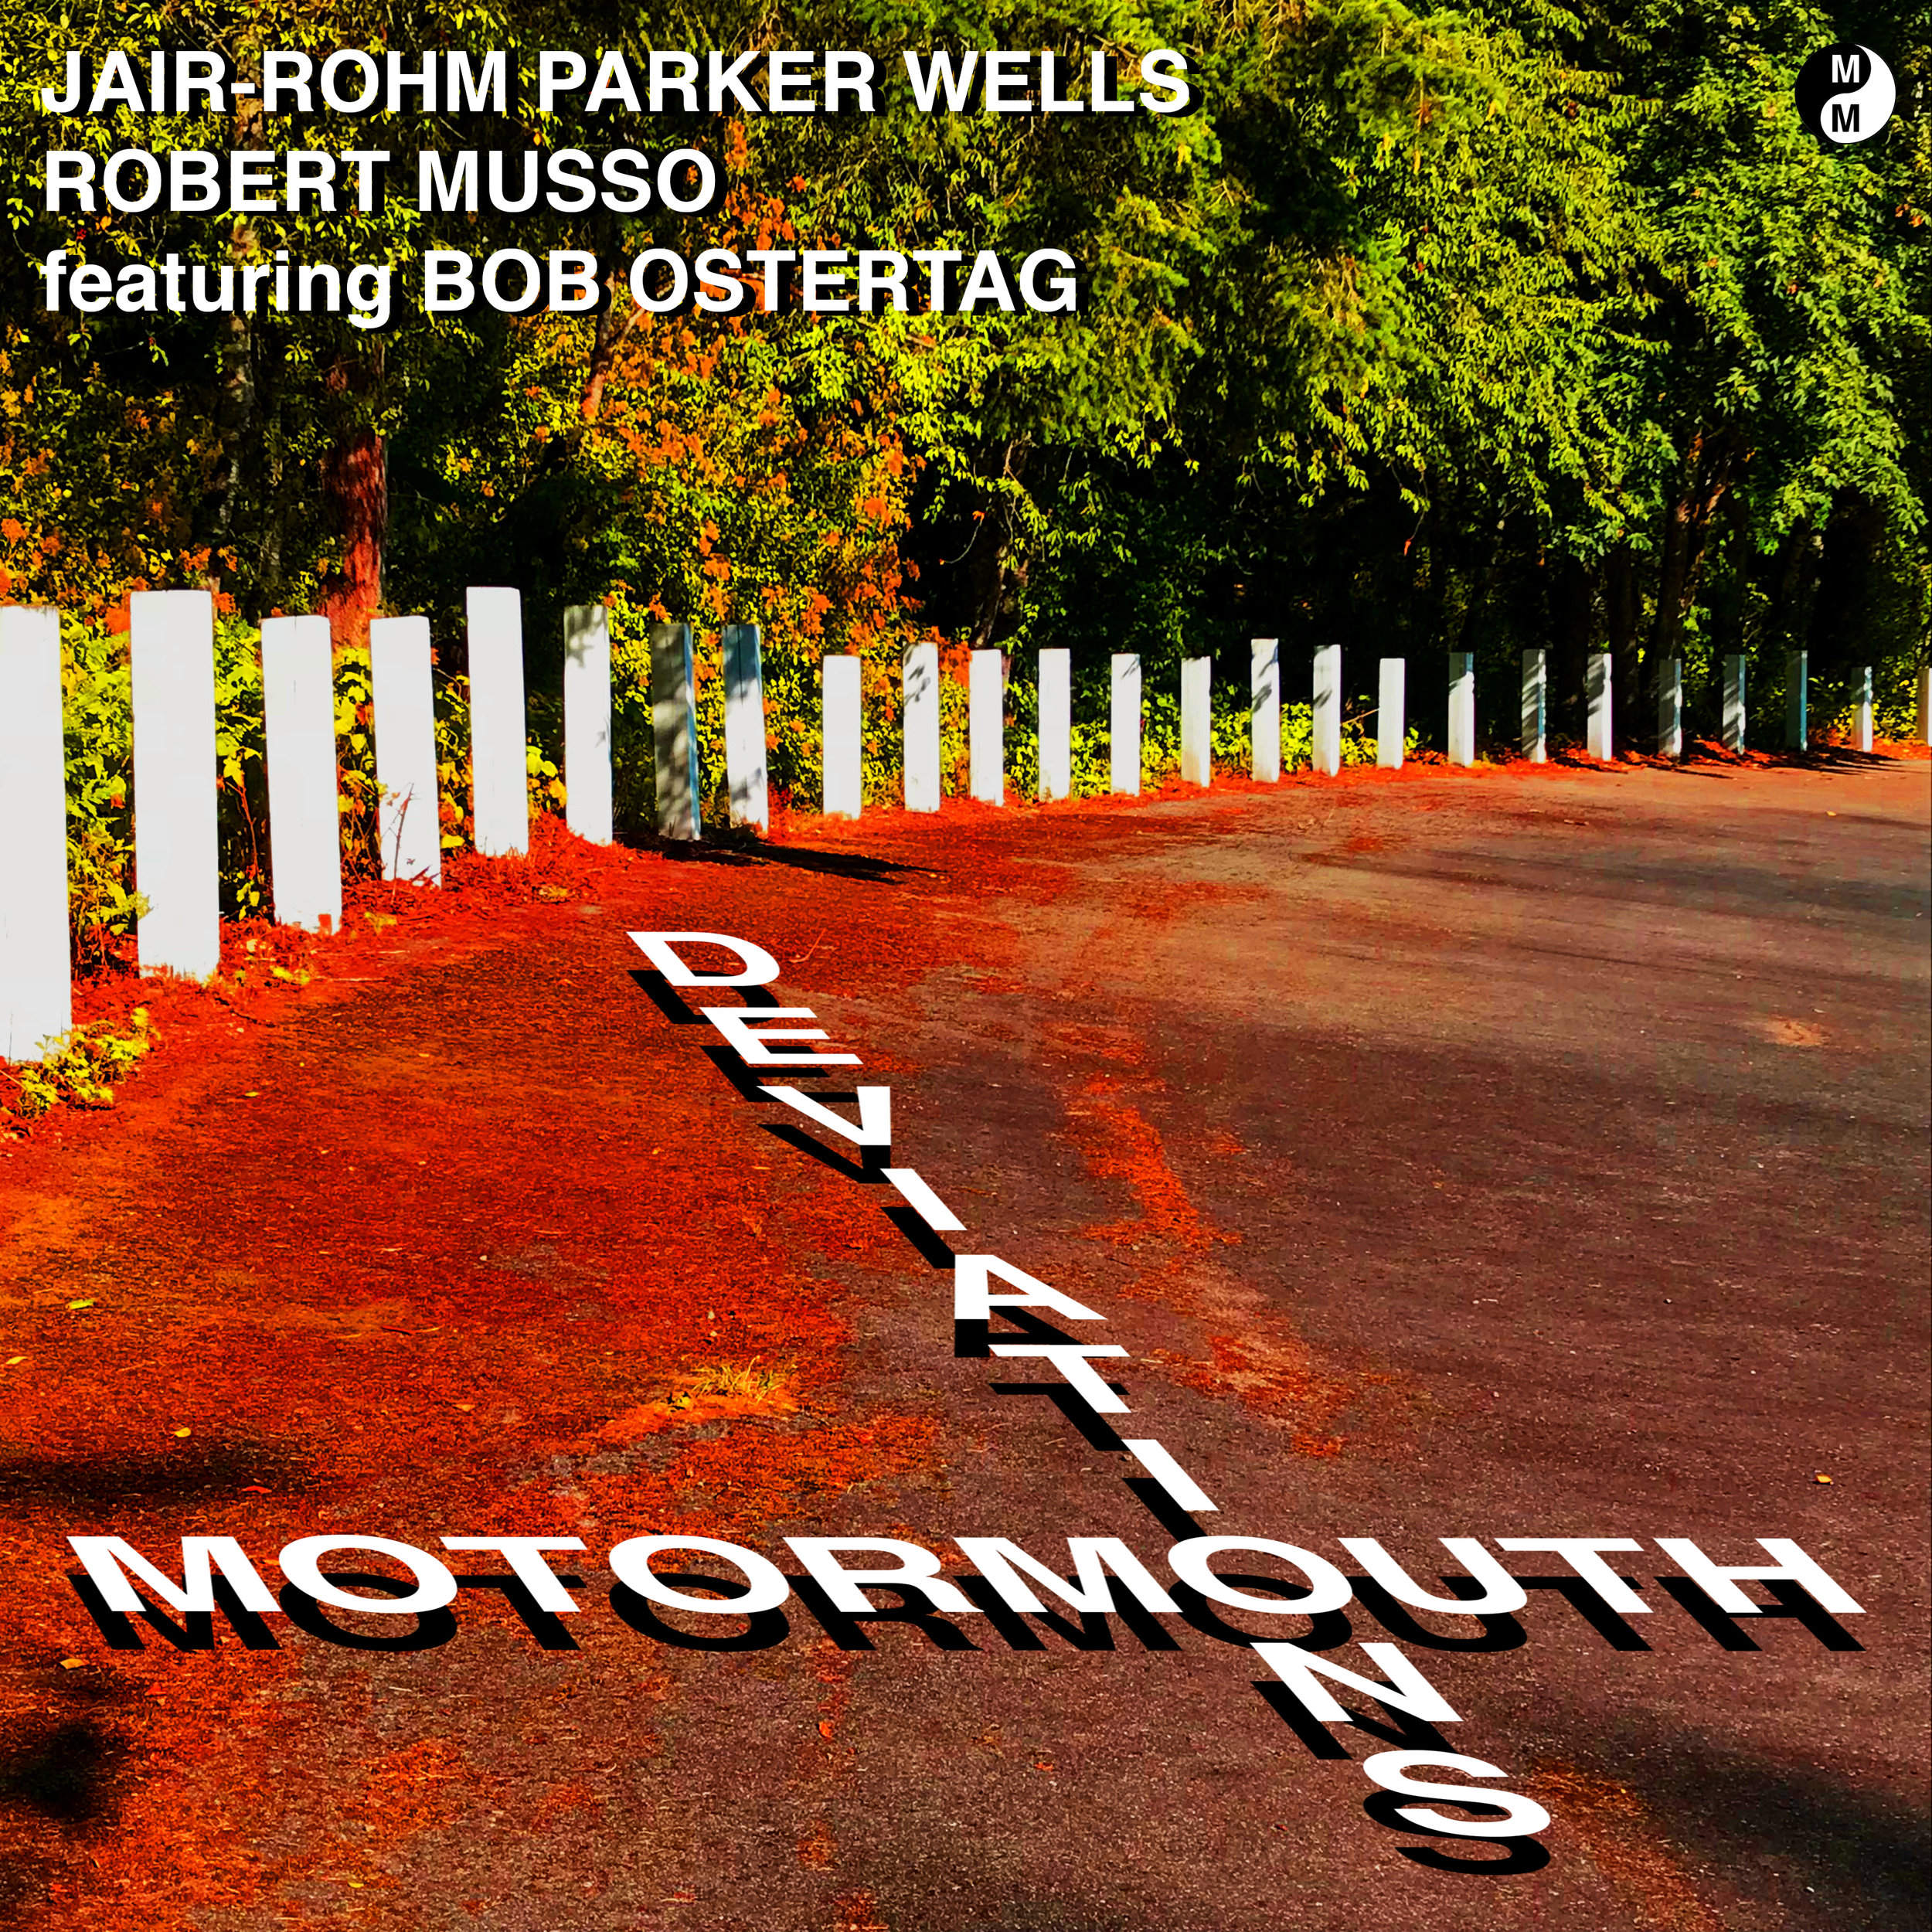 Motormouth Deviations - Jair-Rohm Parker Wells, Robert Musso, featuring Bob Ostertag